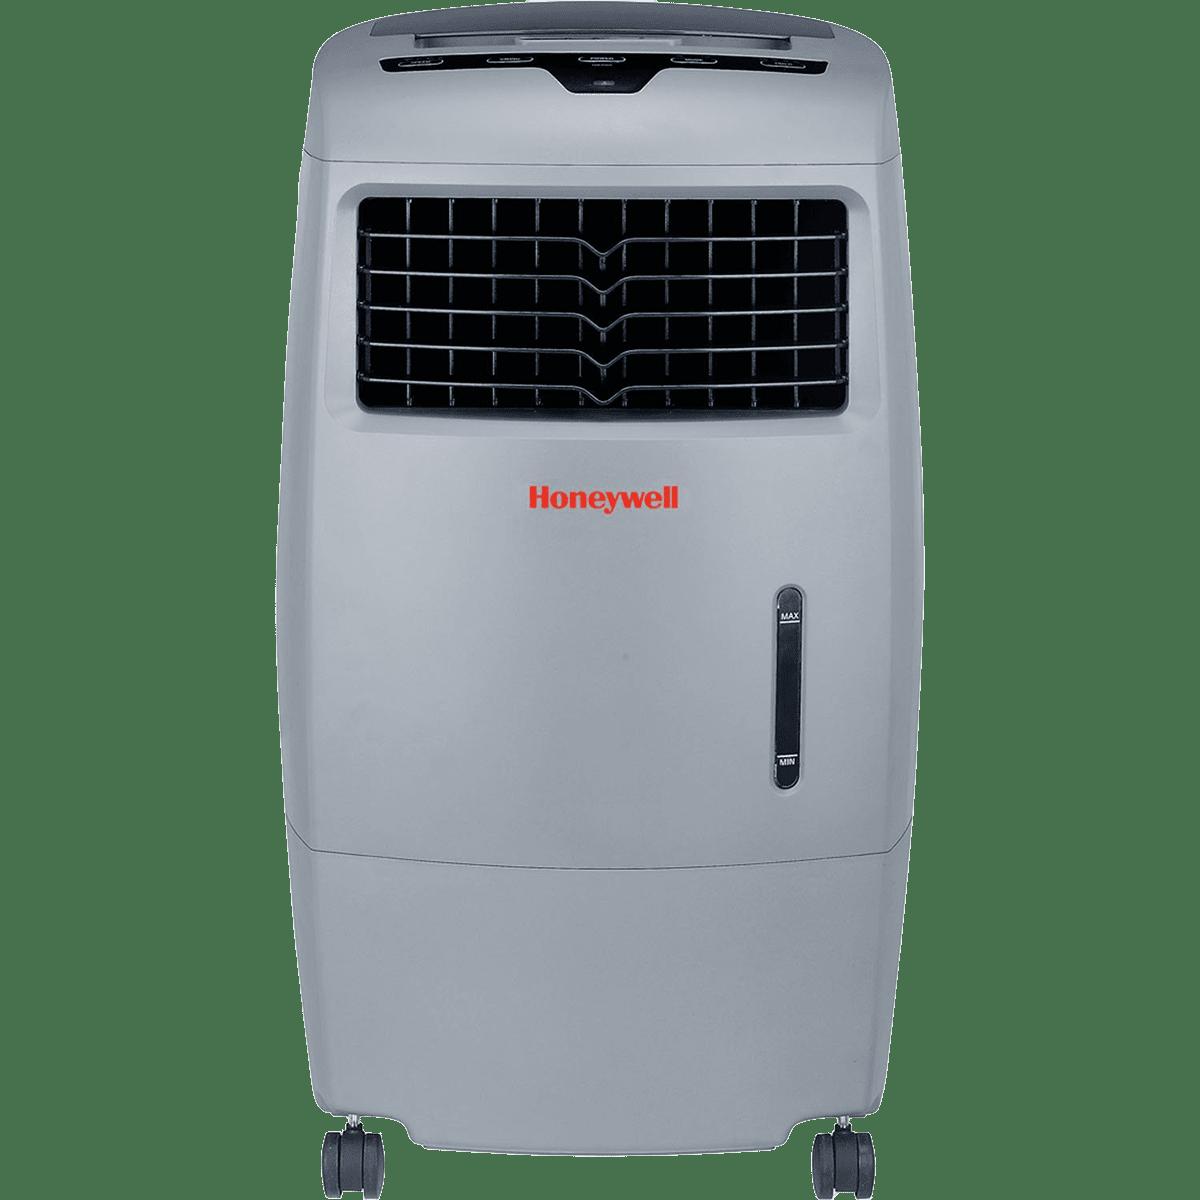 Honeywell 52 Pint Evaporative Air Cooler - CO25AE ho3159